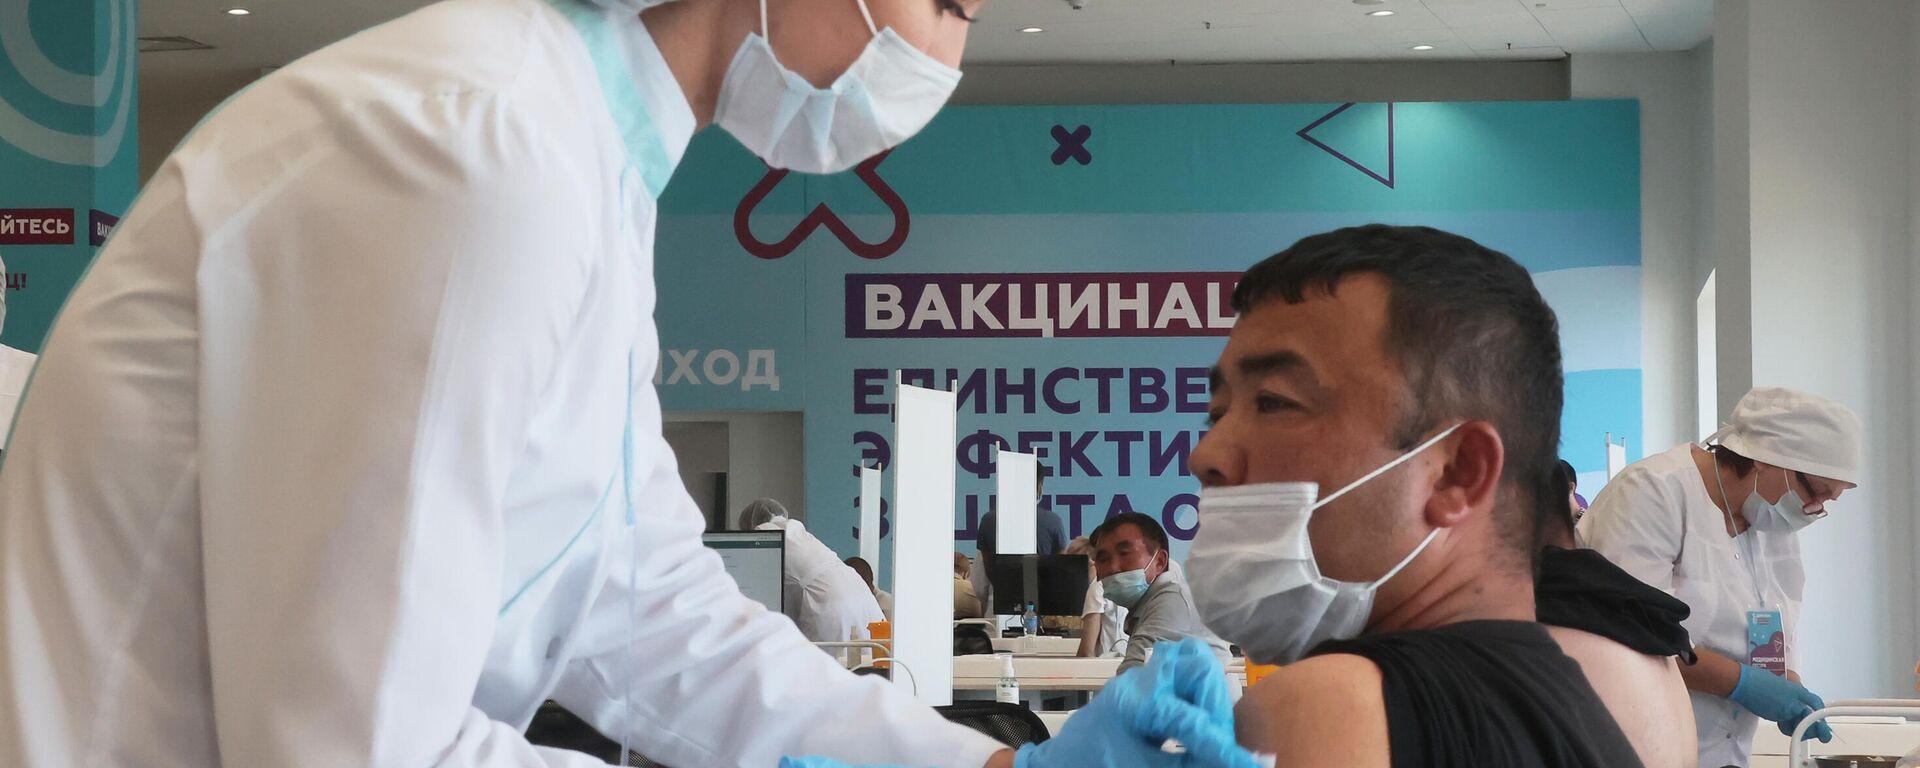 Центр вакцинации от COVID-19 в Лужниках - Sputnik Узбекистан, 1920, 06.08.2021